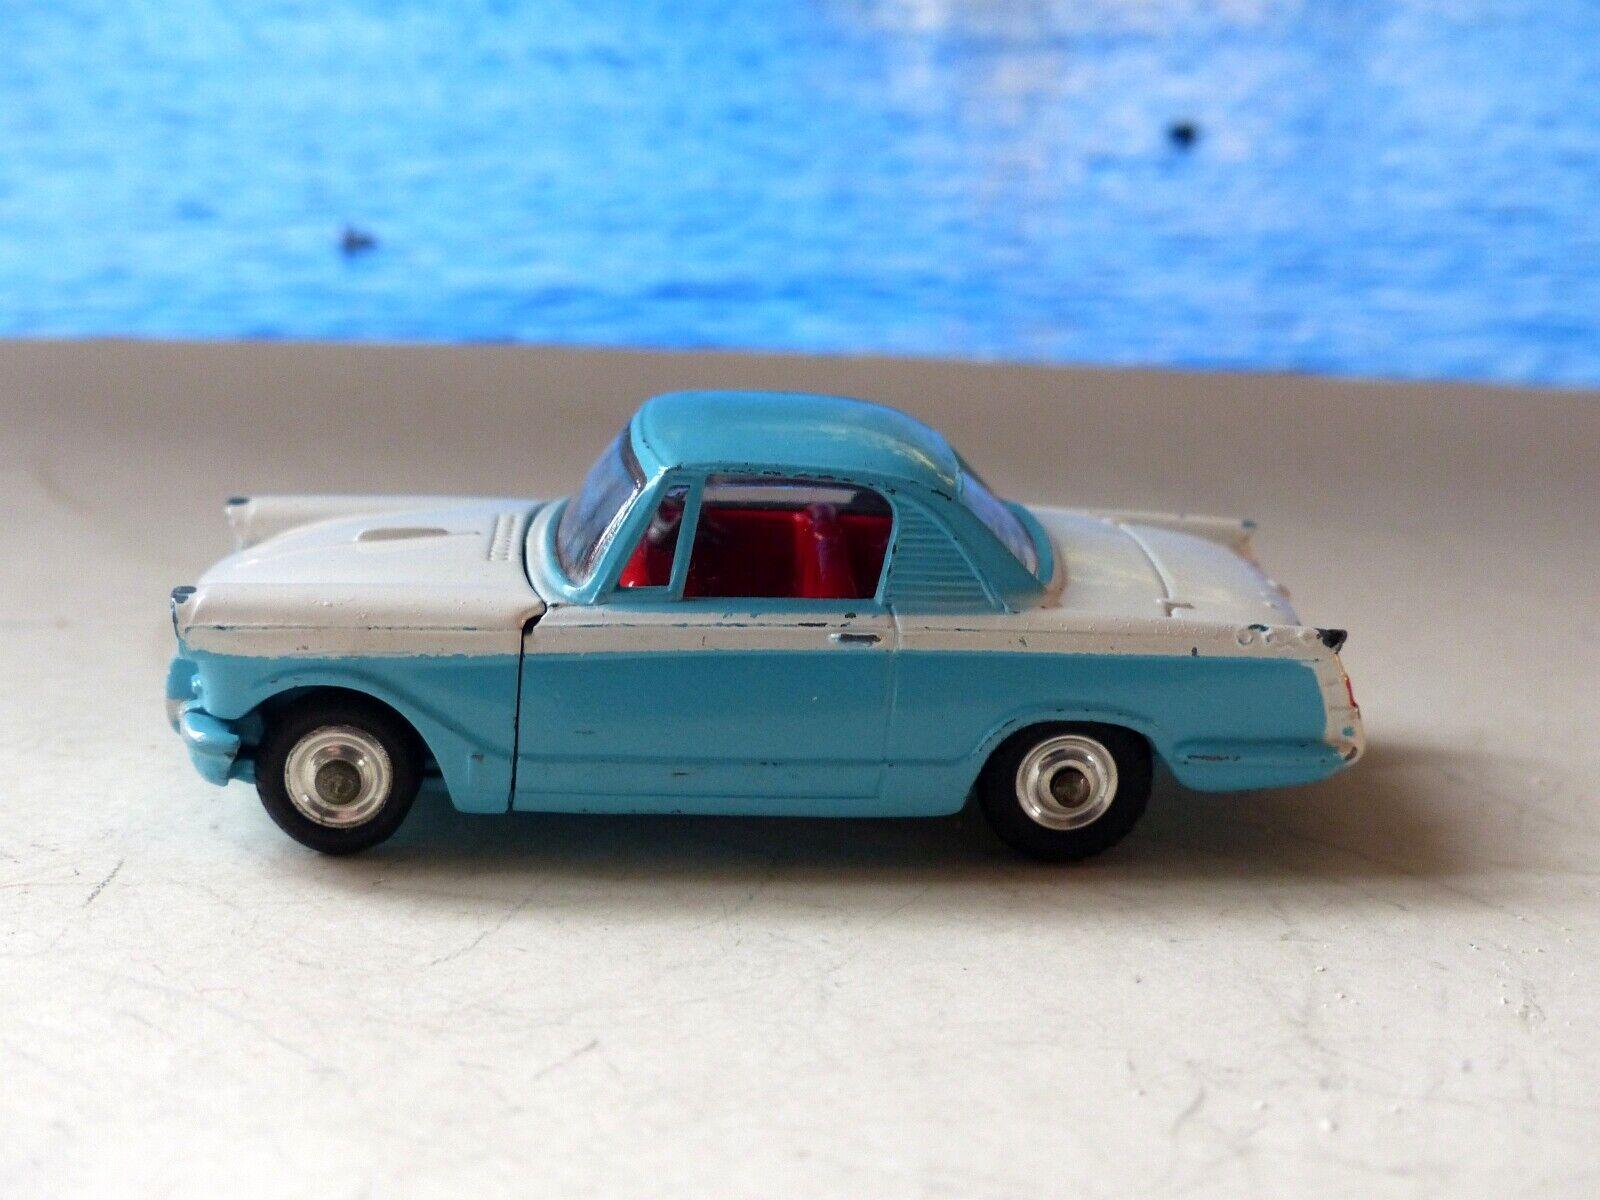 Corgi Toys 231 Triumph Herald 1500 Coupé in bluee and white